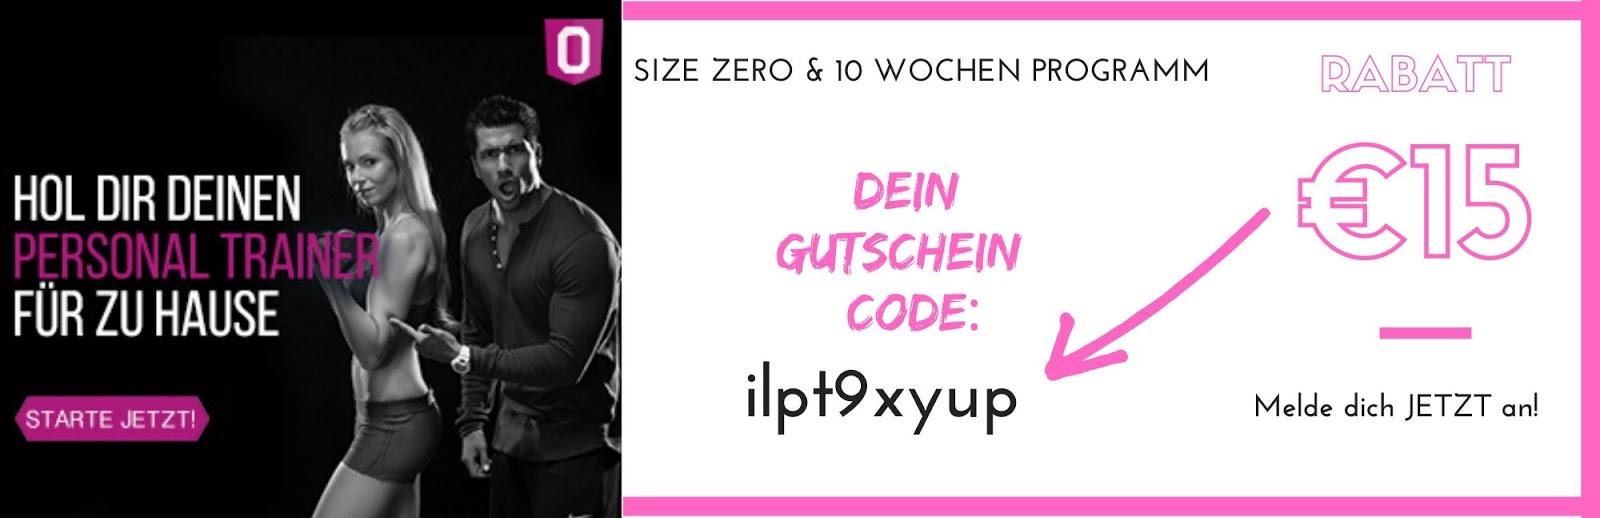 https://www.size-zero.de/